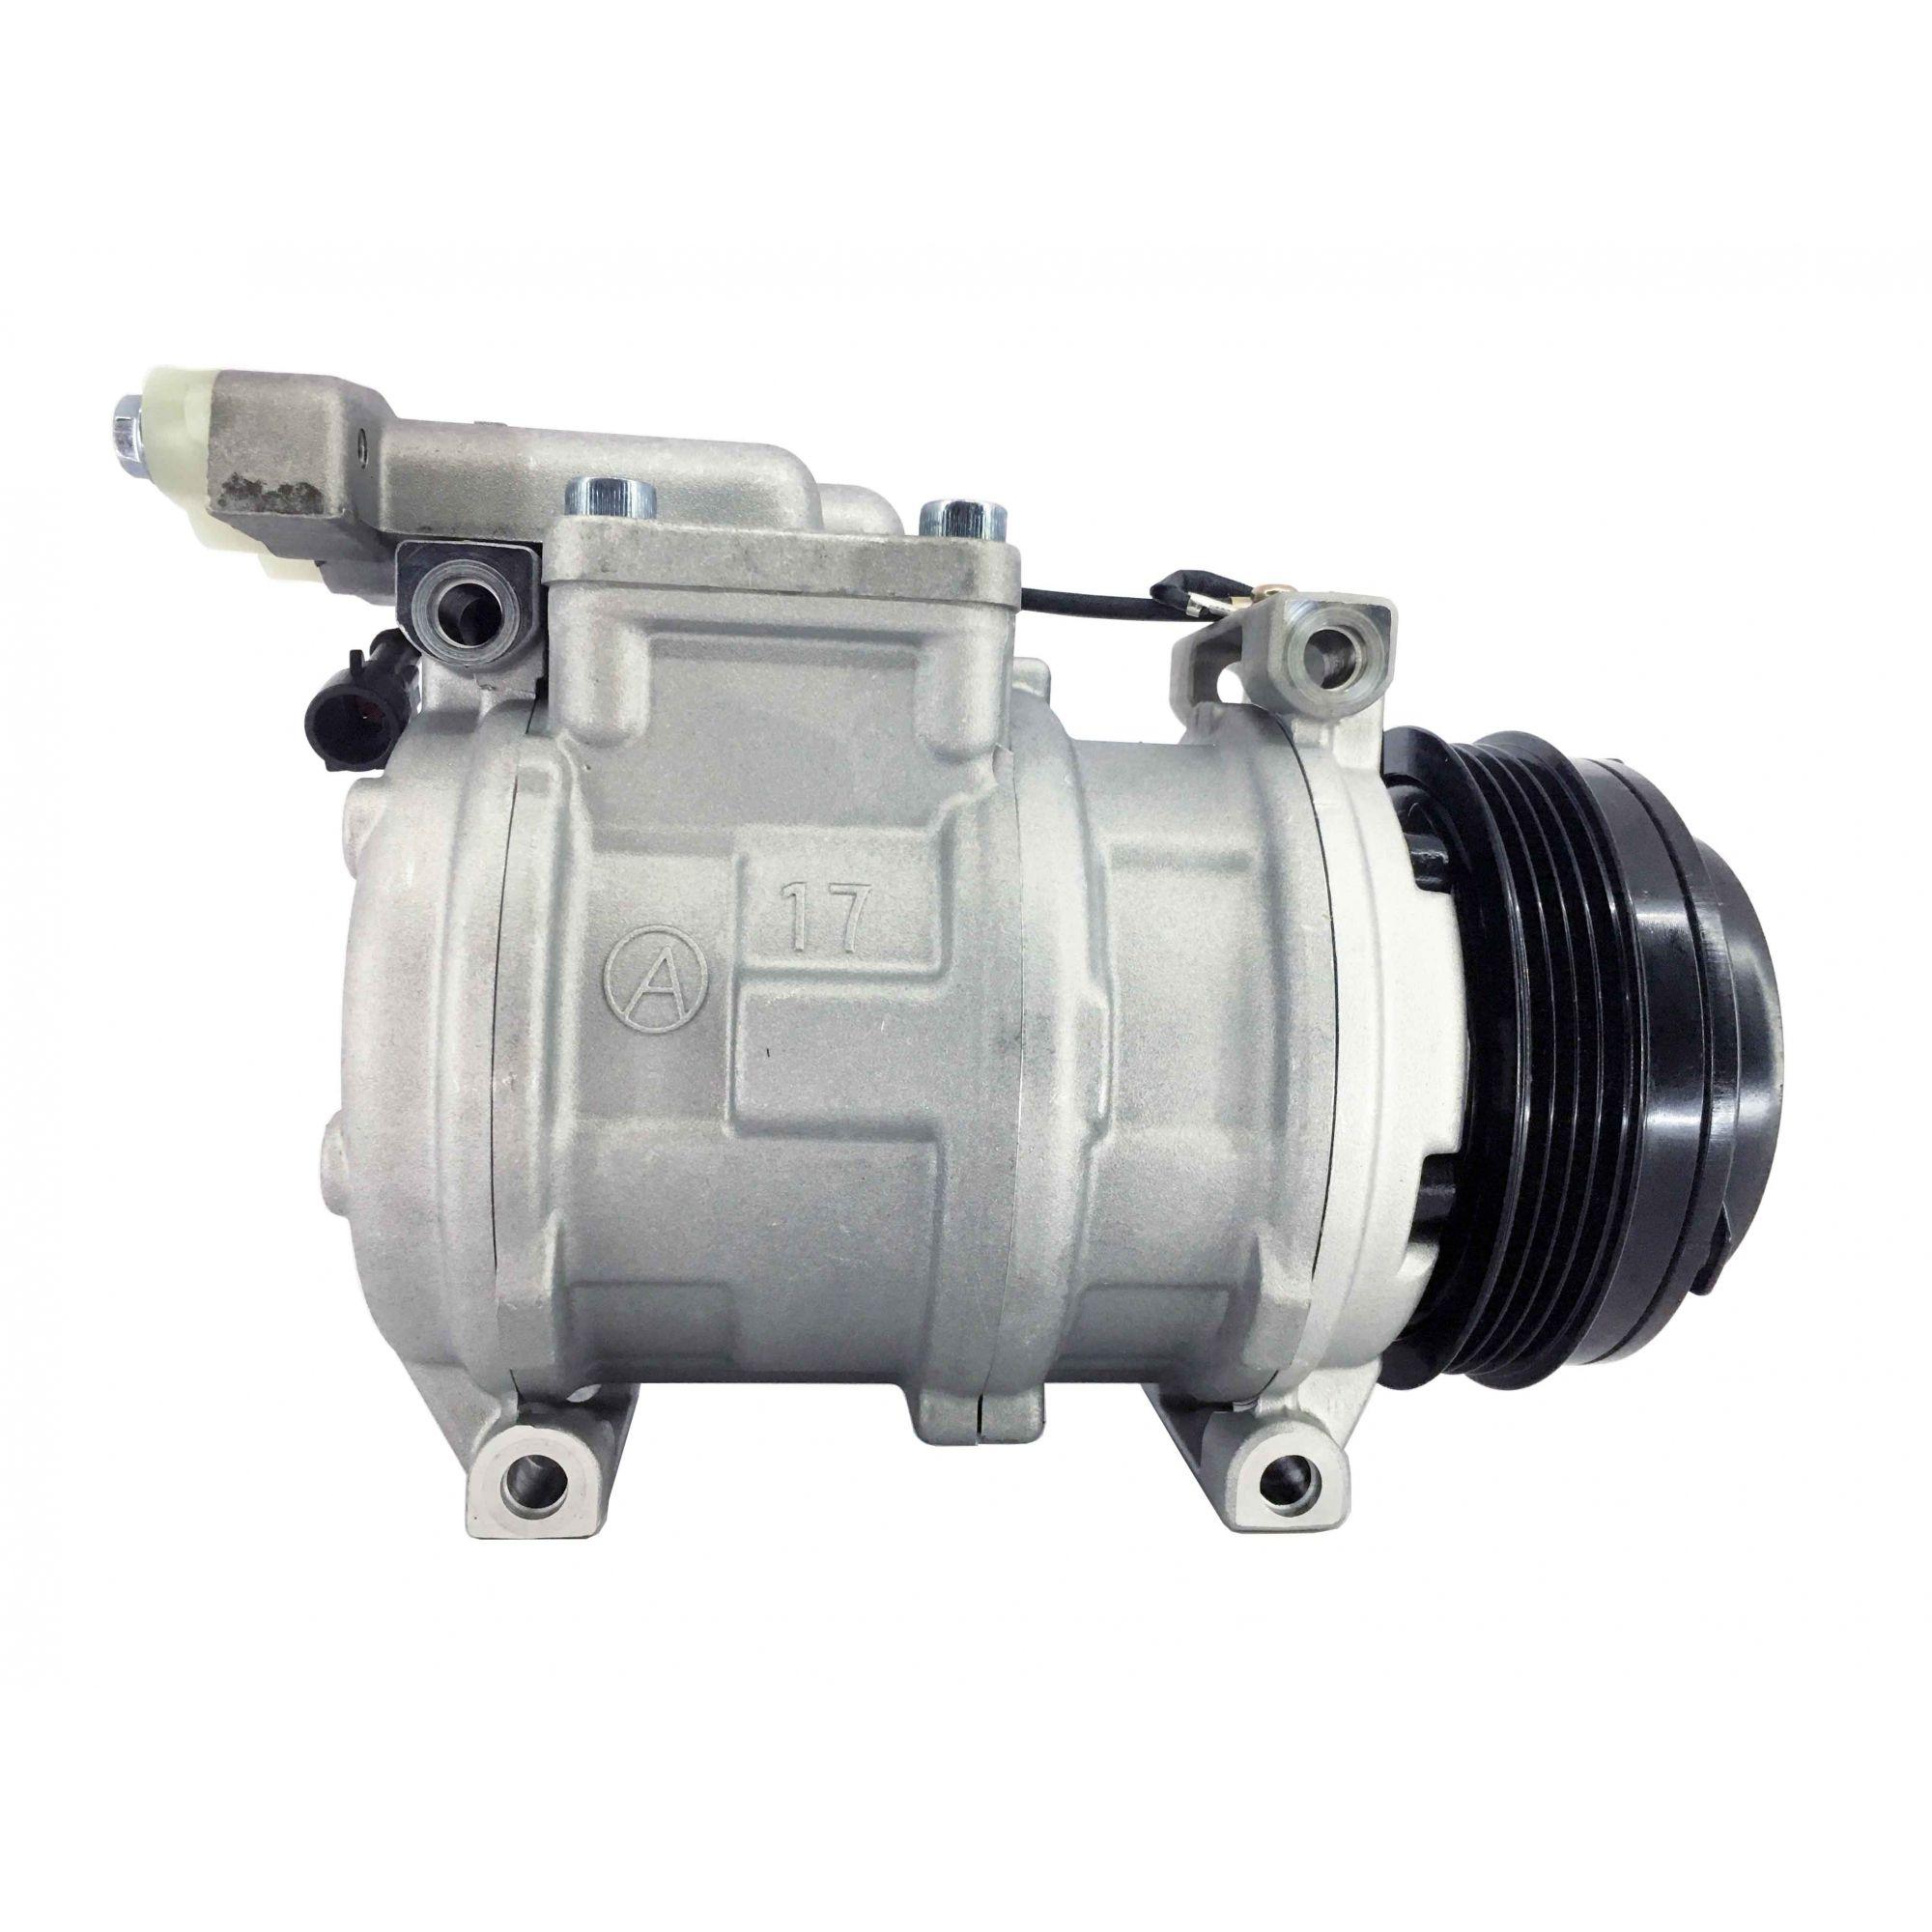 Compressor 10PA17C Iveco Stralis 24v